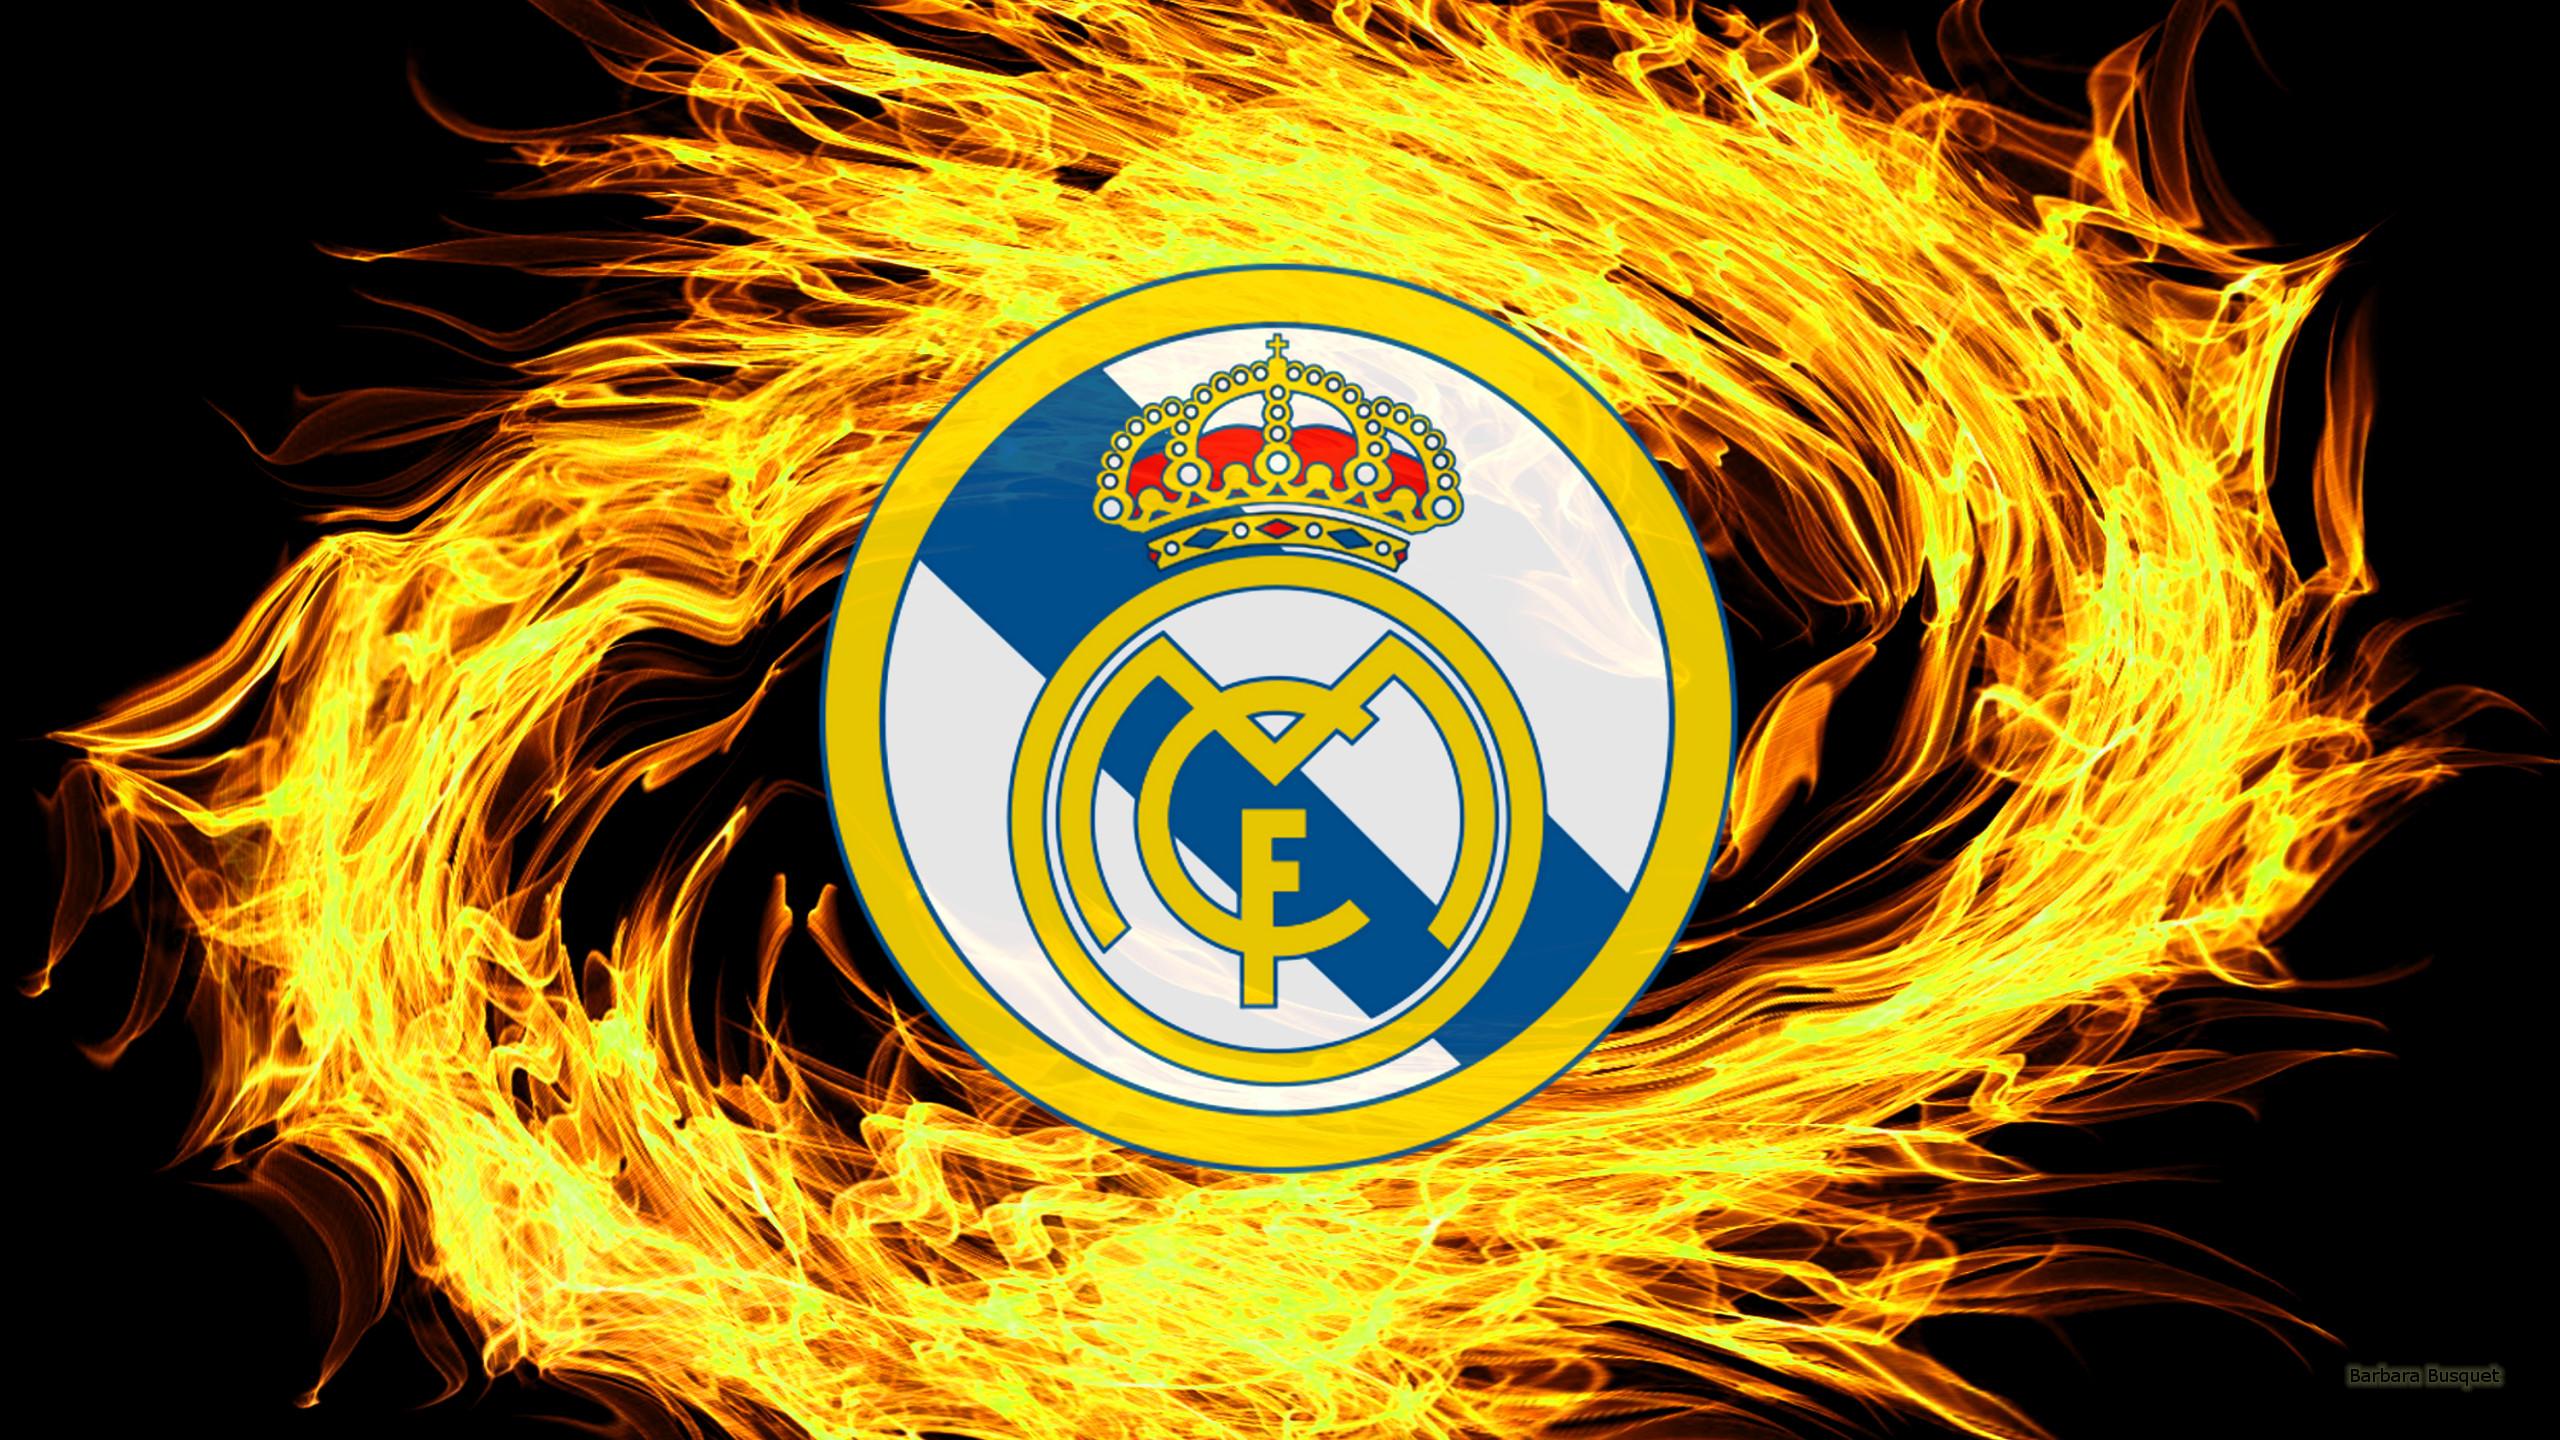 Real Madrid Logo Hd Wallpaper Background Image 2560x1440